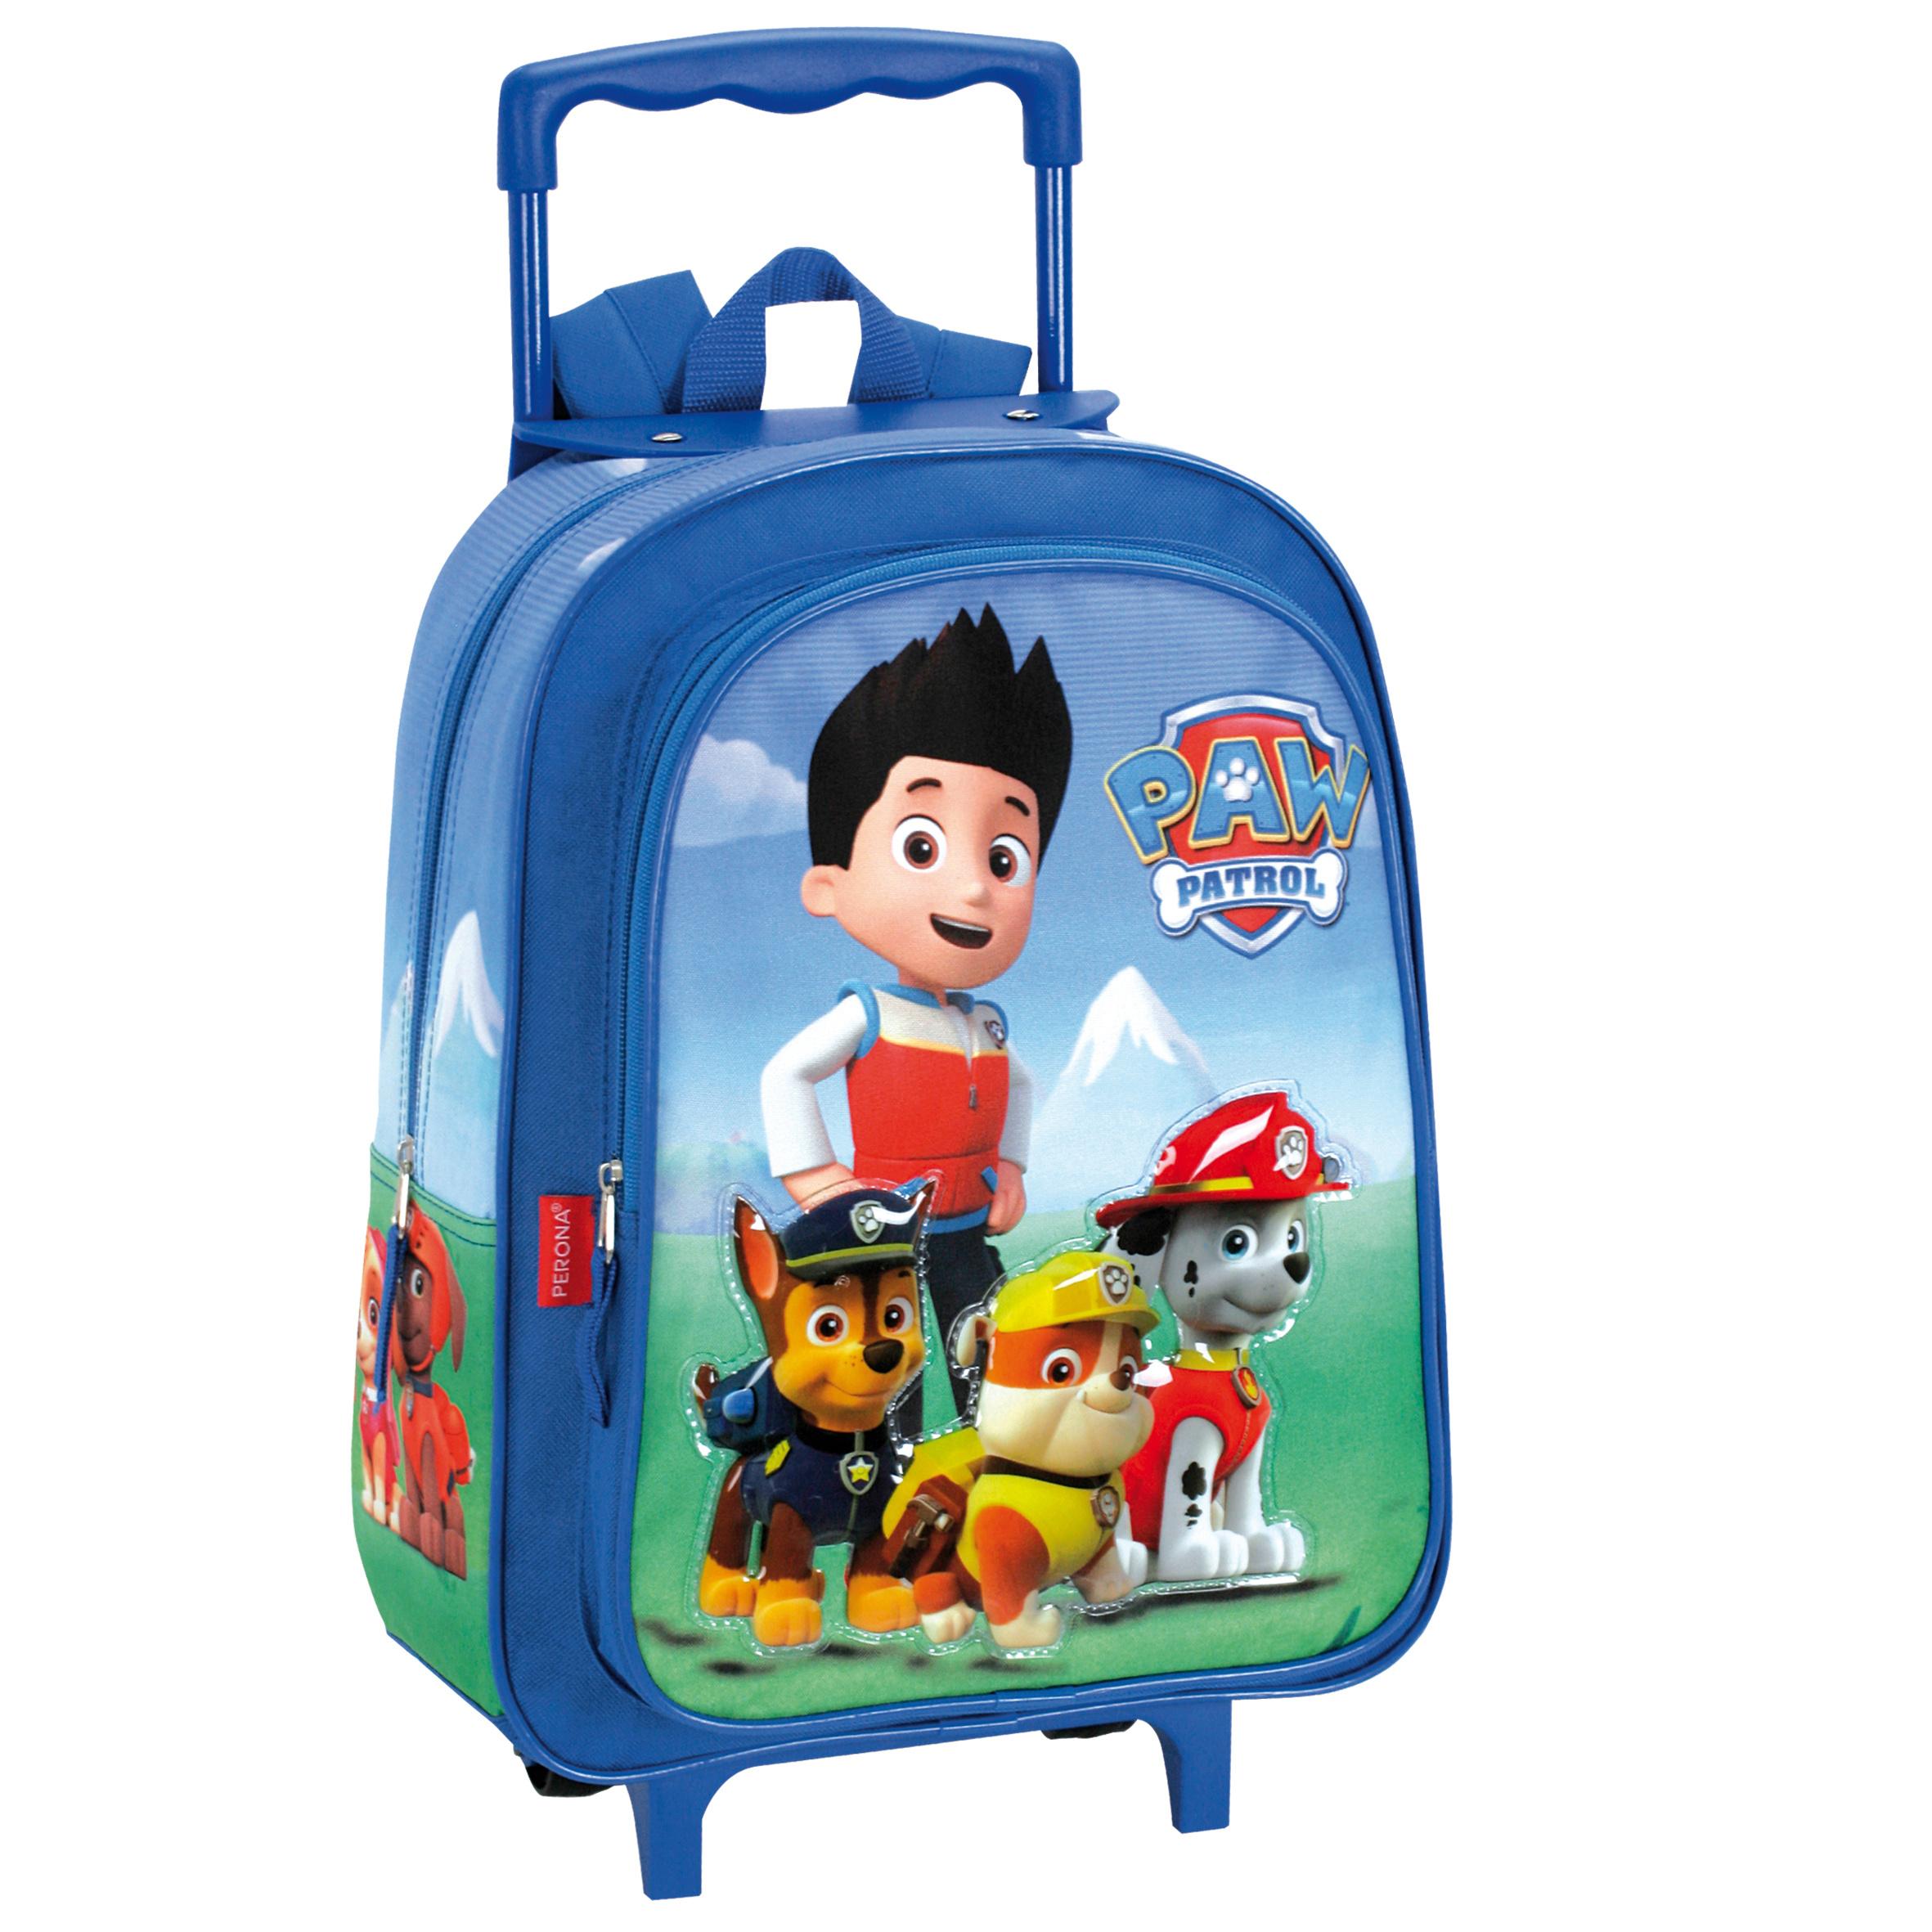 67f2c9874bc Τσάντα τρόλλευ Paw Patrol   ToysForKids e-shop